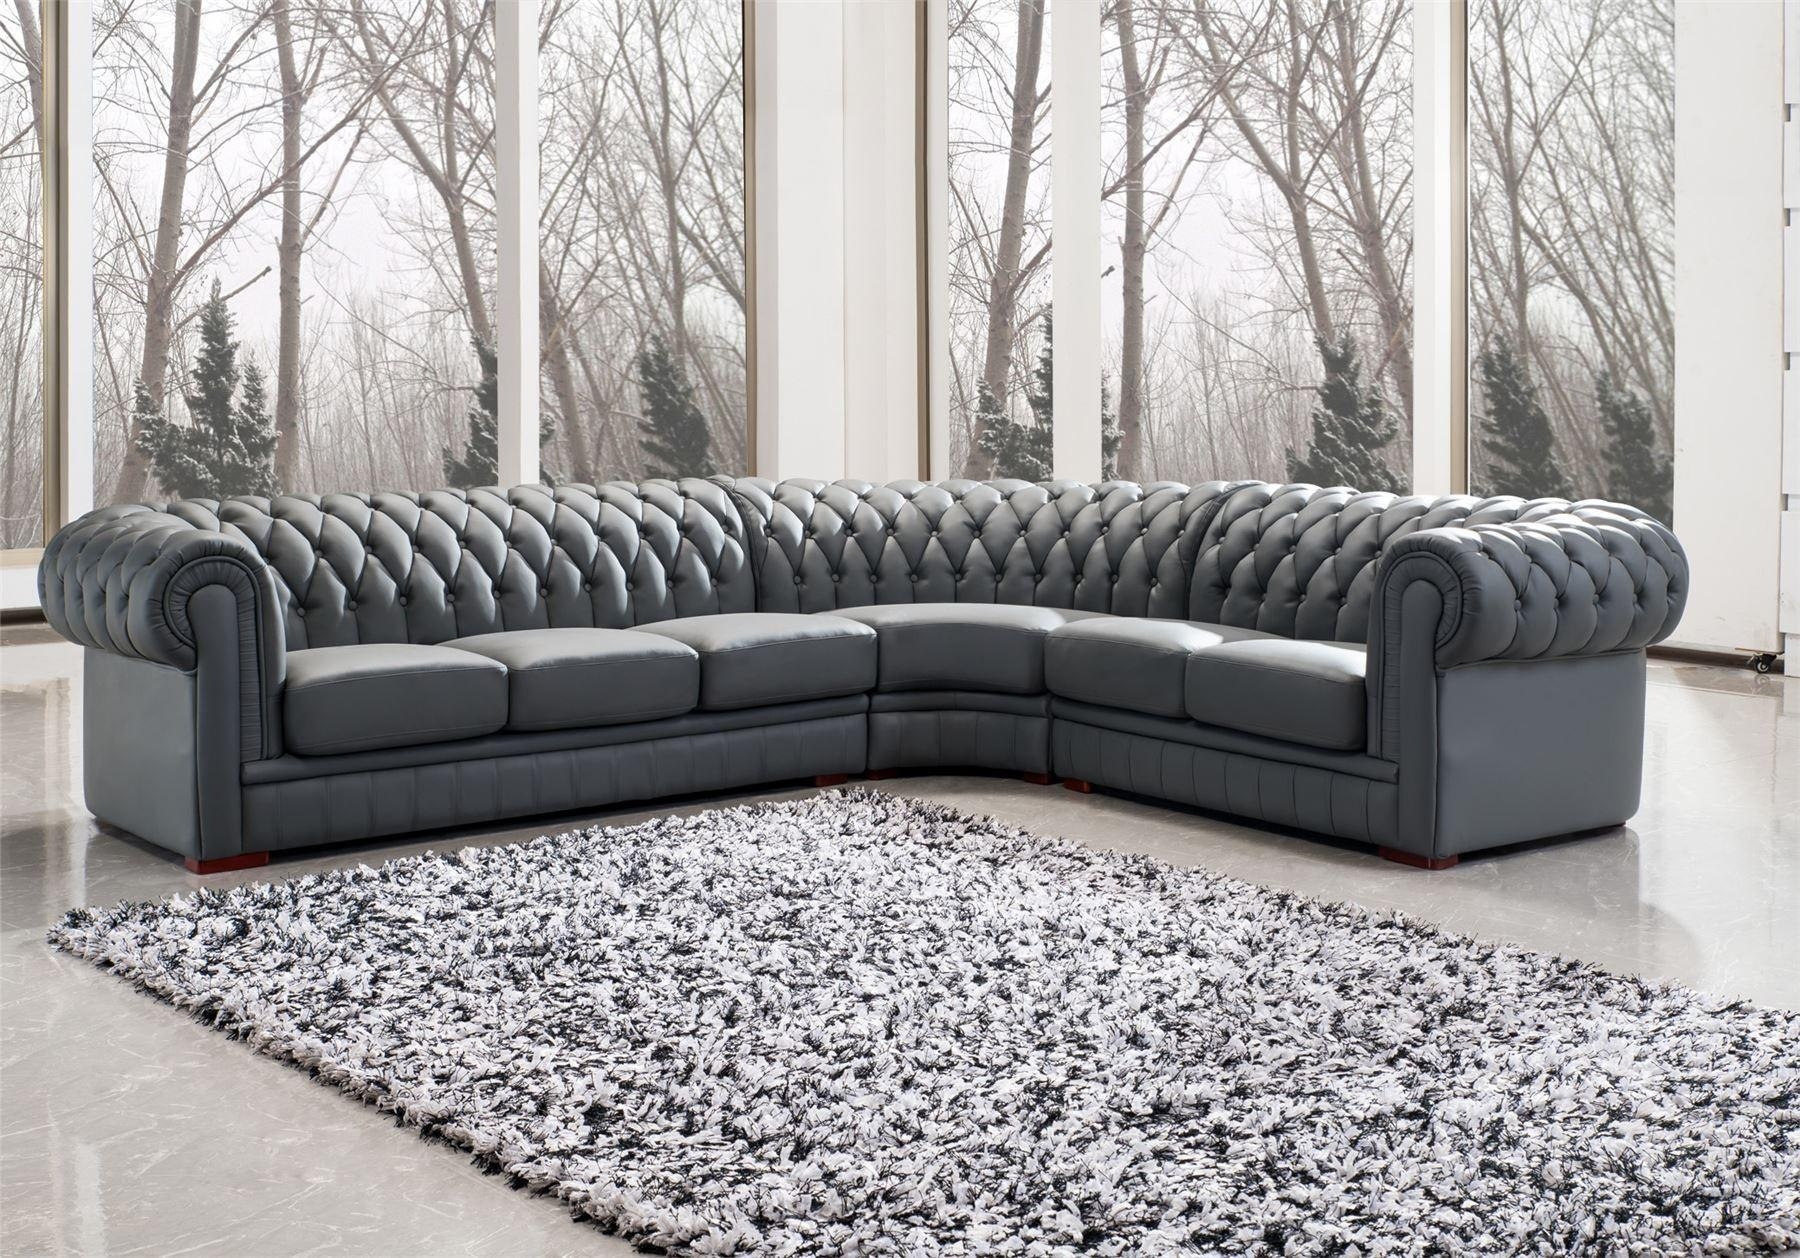 ▻ Sofa : 27 Wonderful Chesterfield Tufted Sofa Chesterfield Sofa In Tufted Leather Chesterfield Sofas (View 10 of 20)